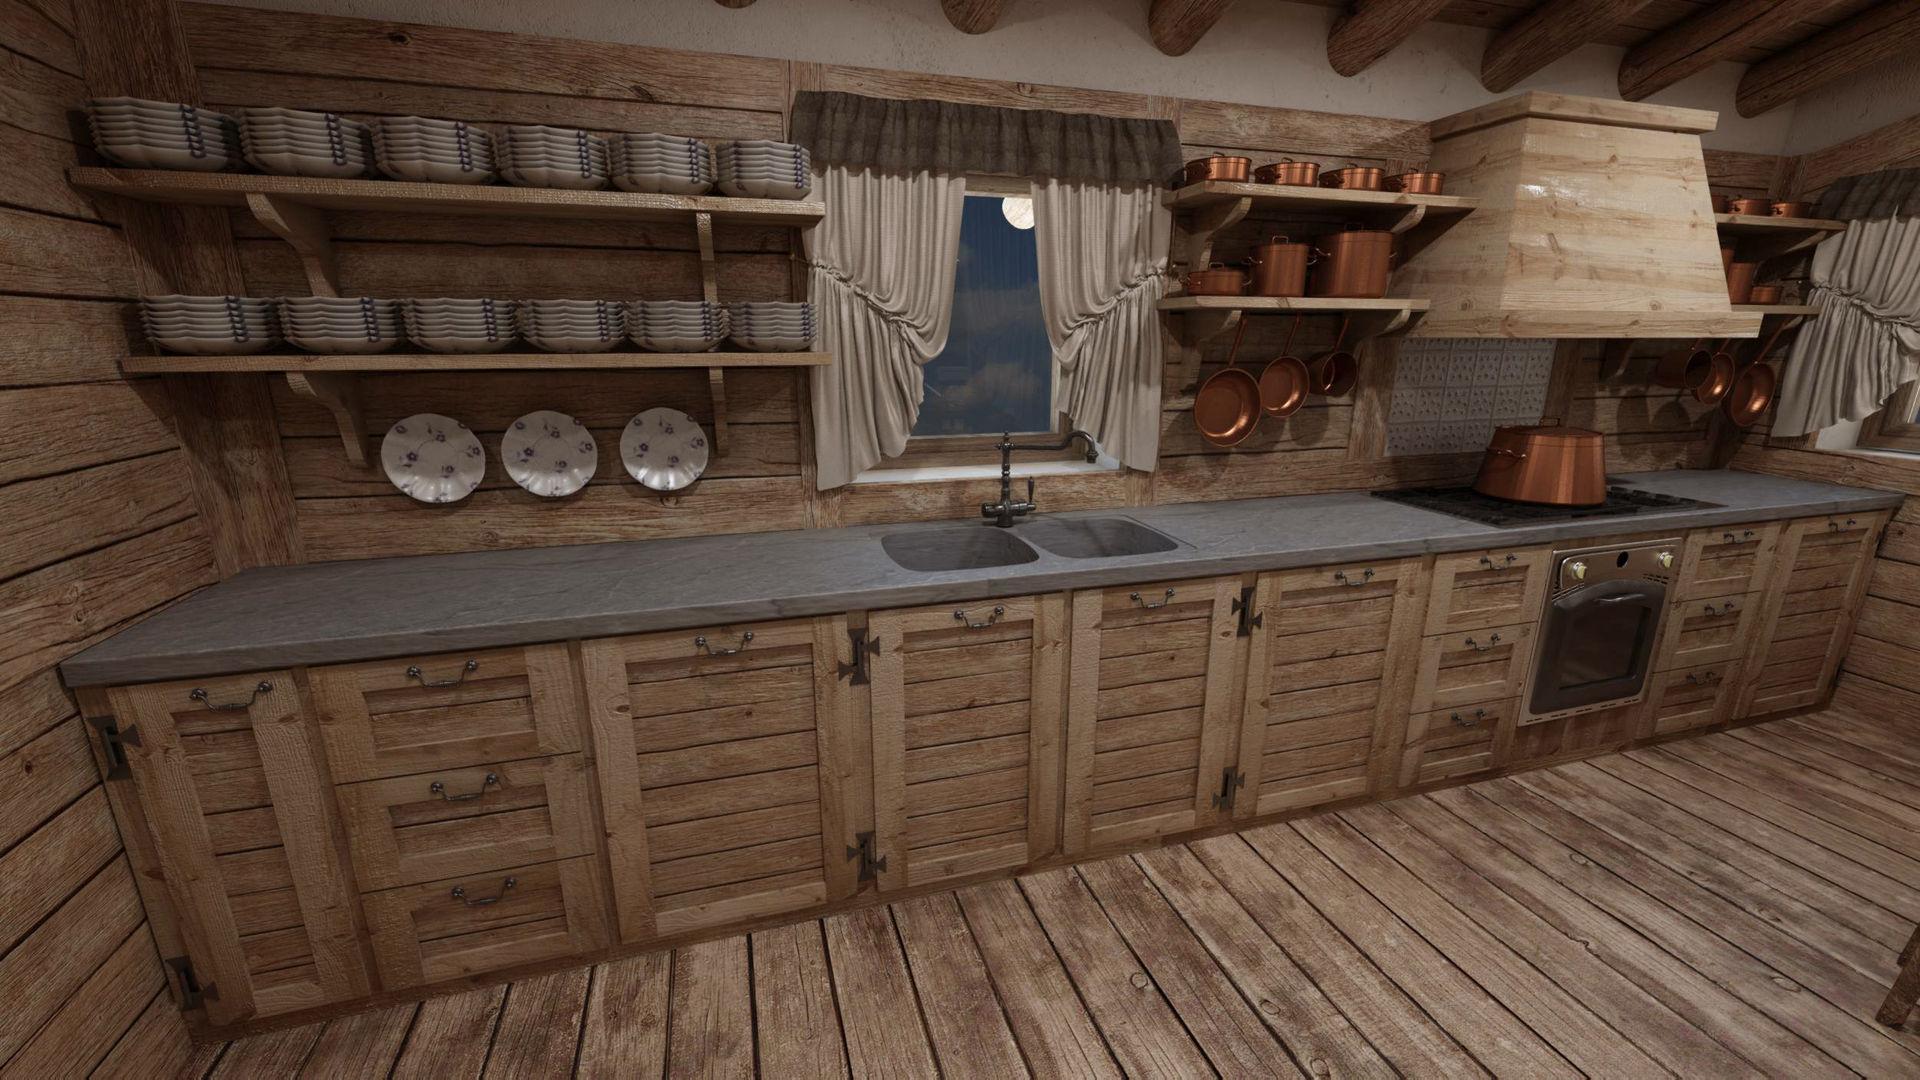 Cucine di montagna av48 regardsdefemmes for Chalet arredamento